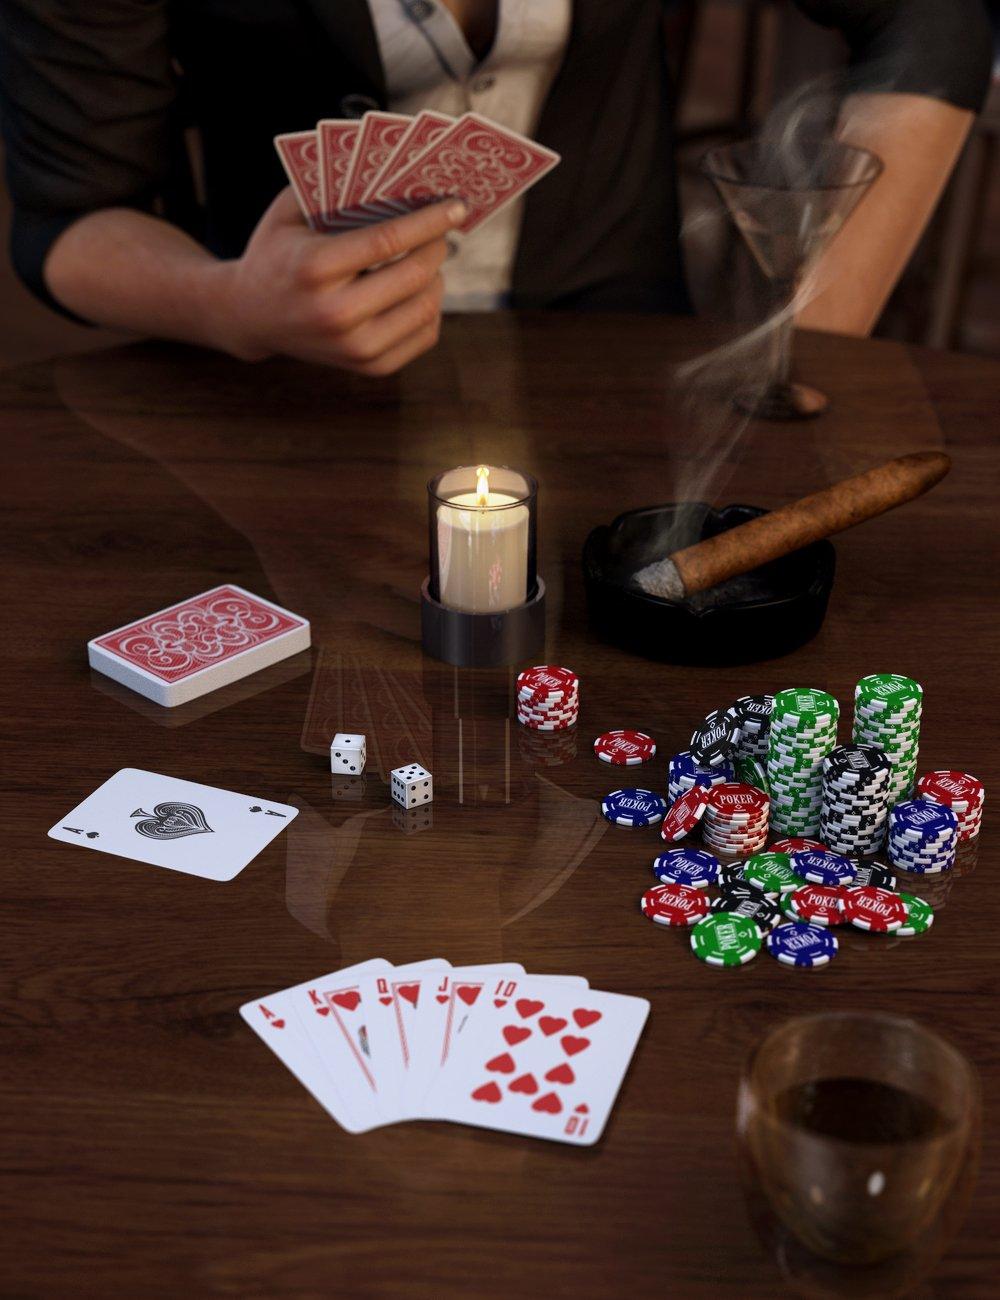 Card Deck Assortment by: ARTCollab, 3D Models by Daz 3D